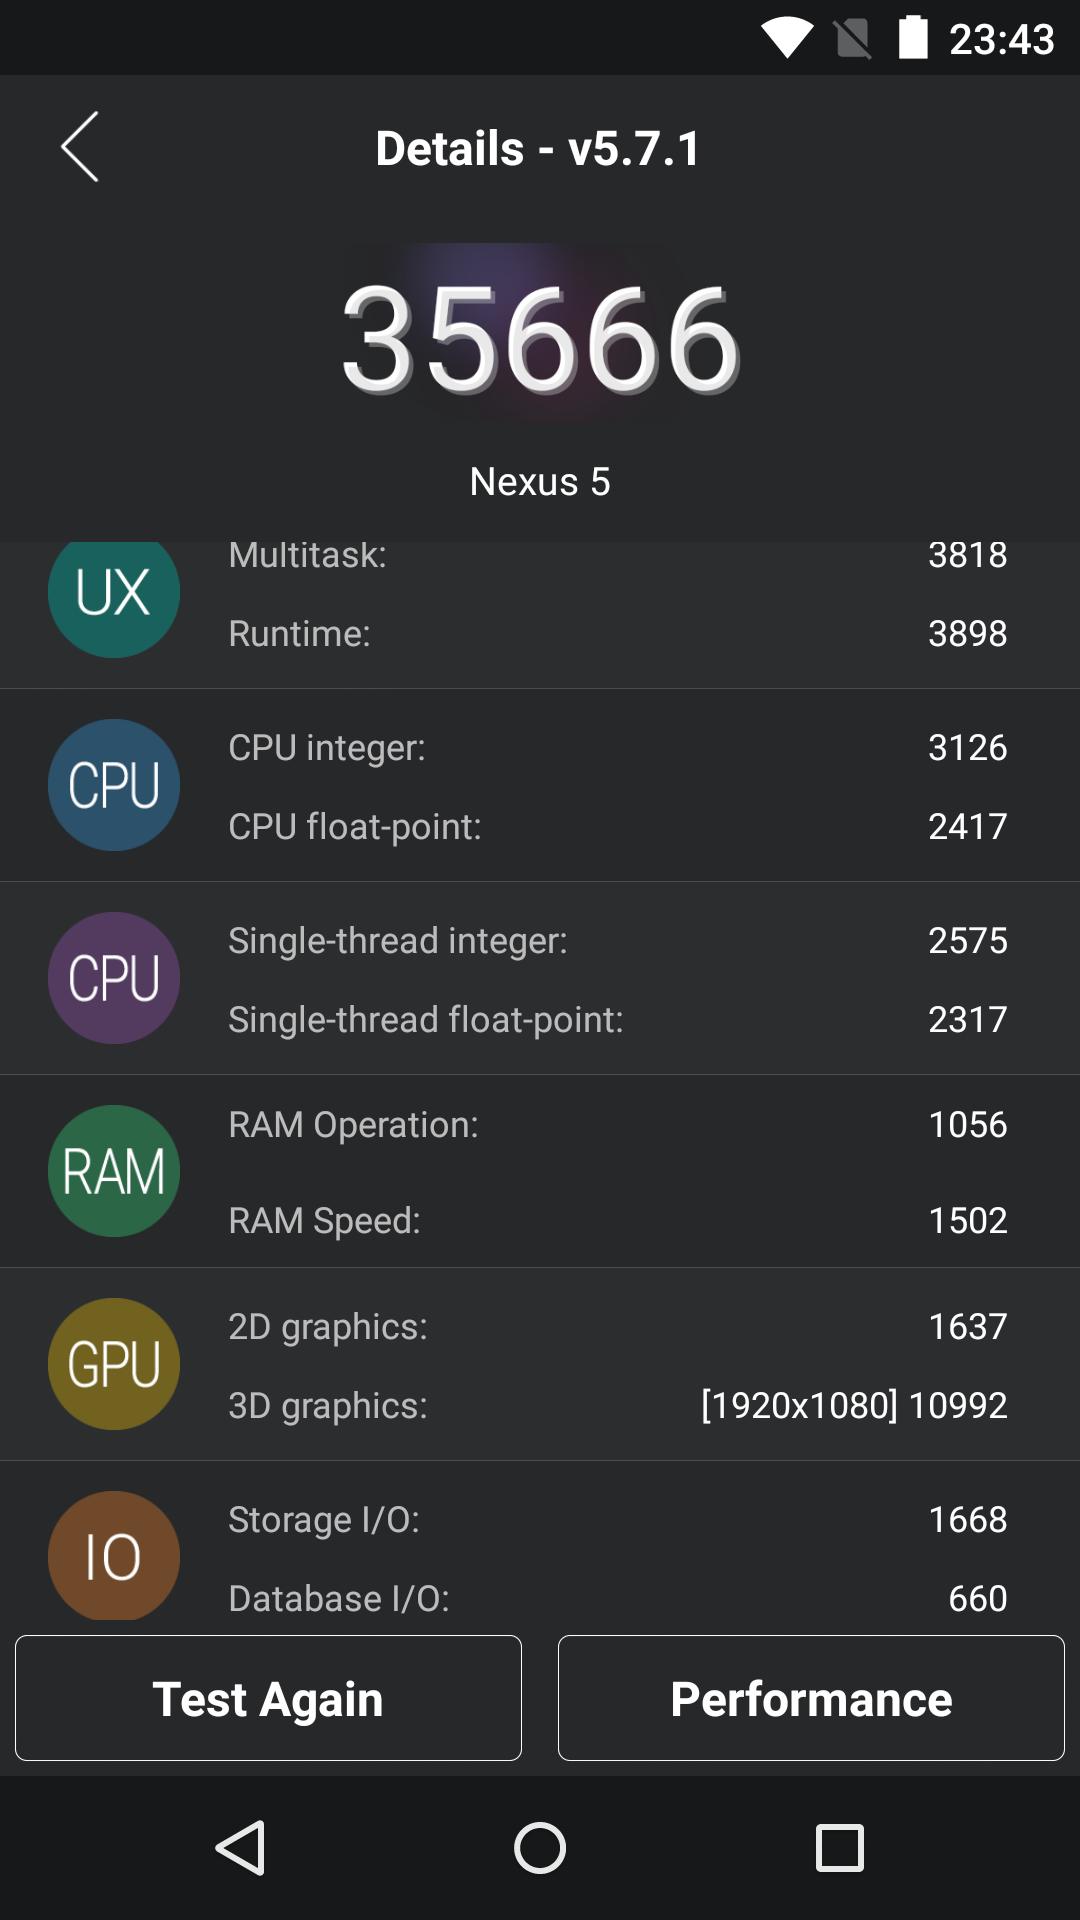 Foto de Benchmarks Nexus 5 Android 5.1.1 (8/43)